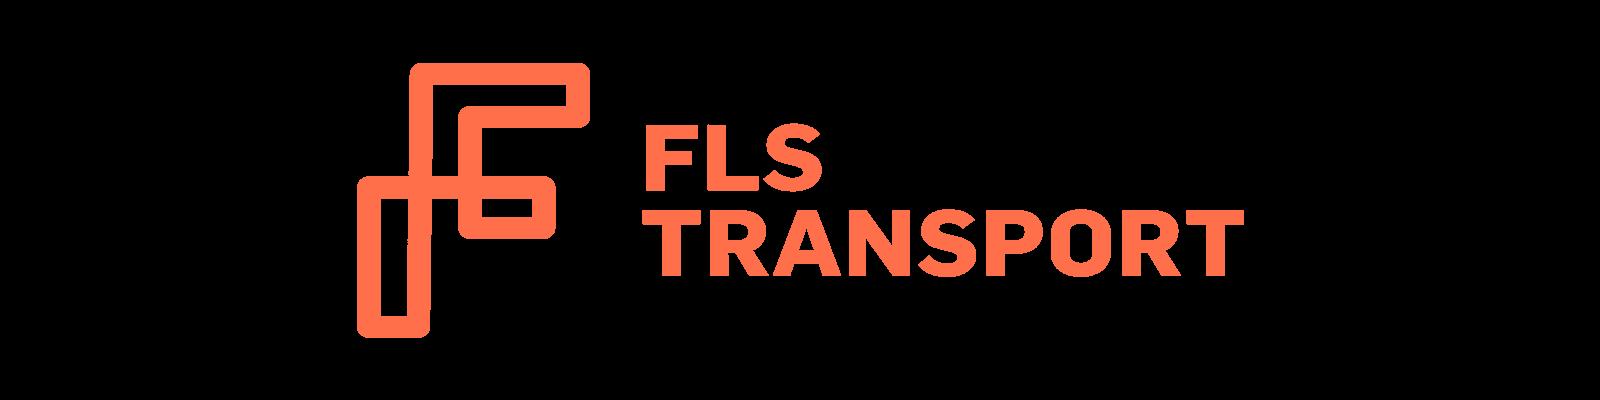 FLS Transportation Logo Design